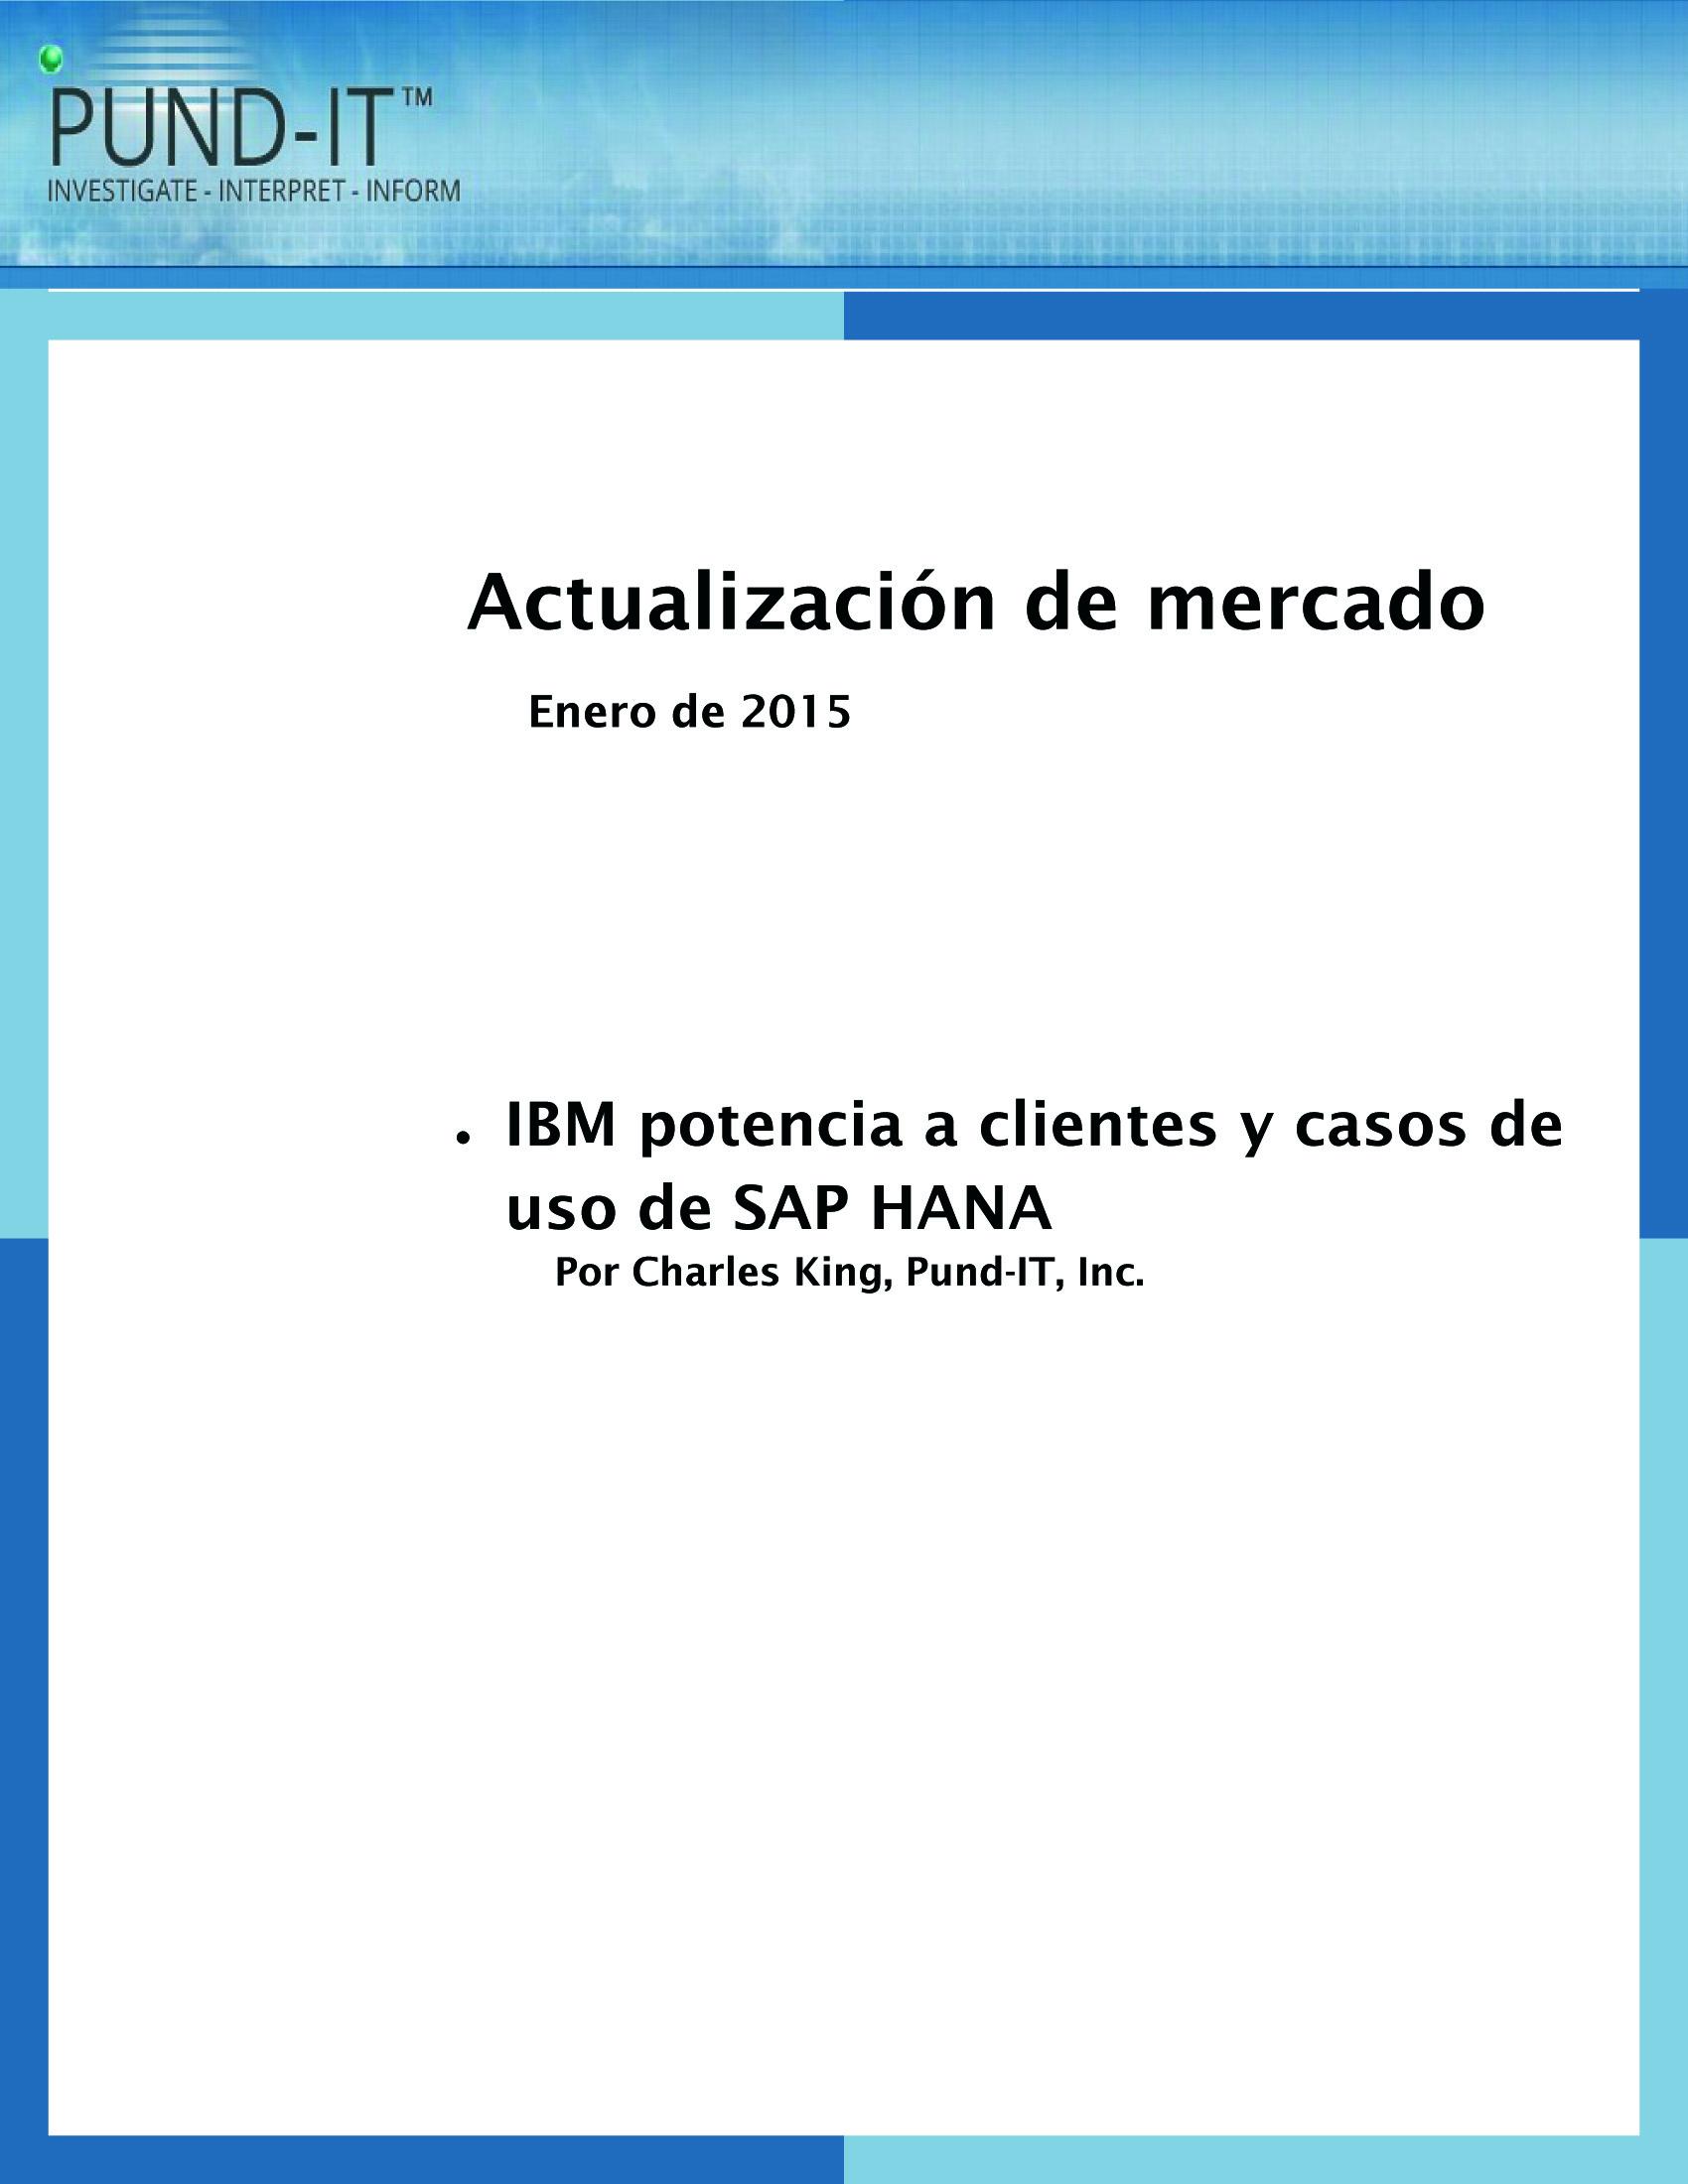 IBM potencia a clientes y casos de uso de SAP HANA